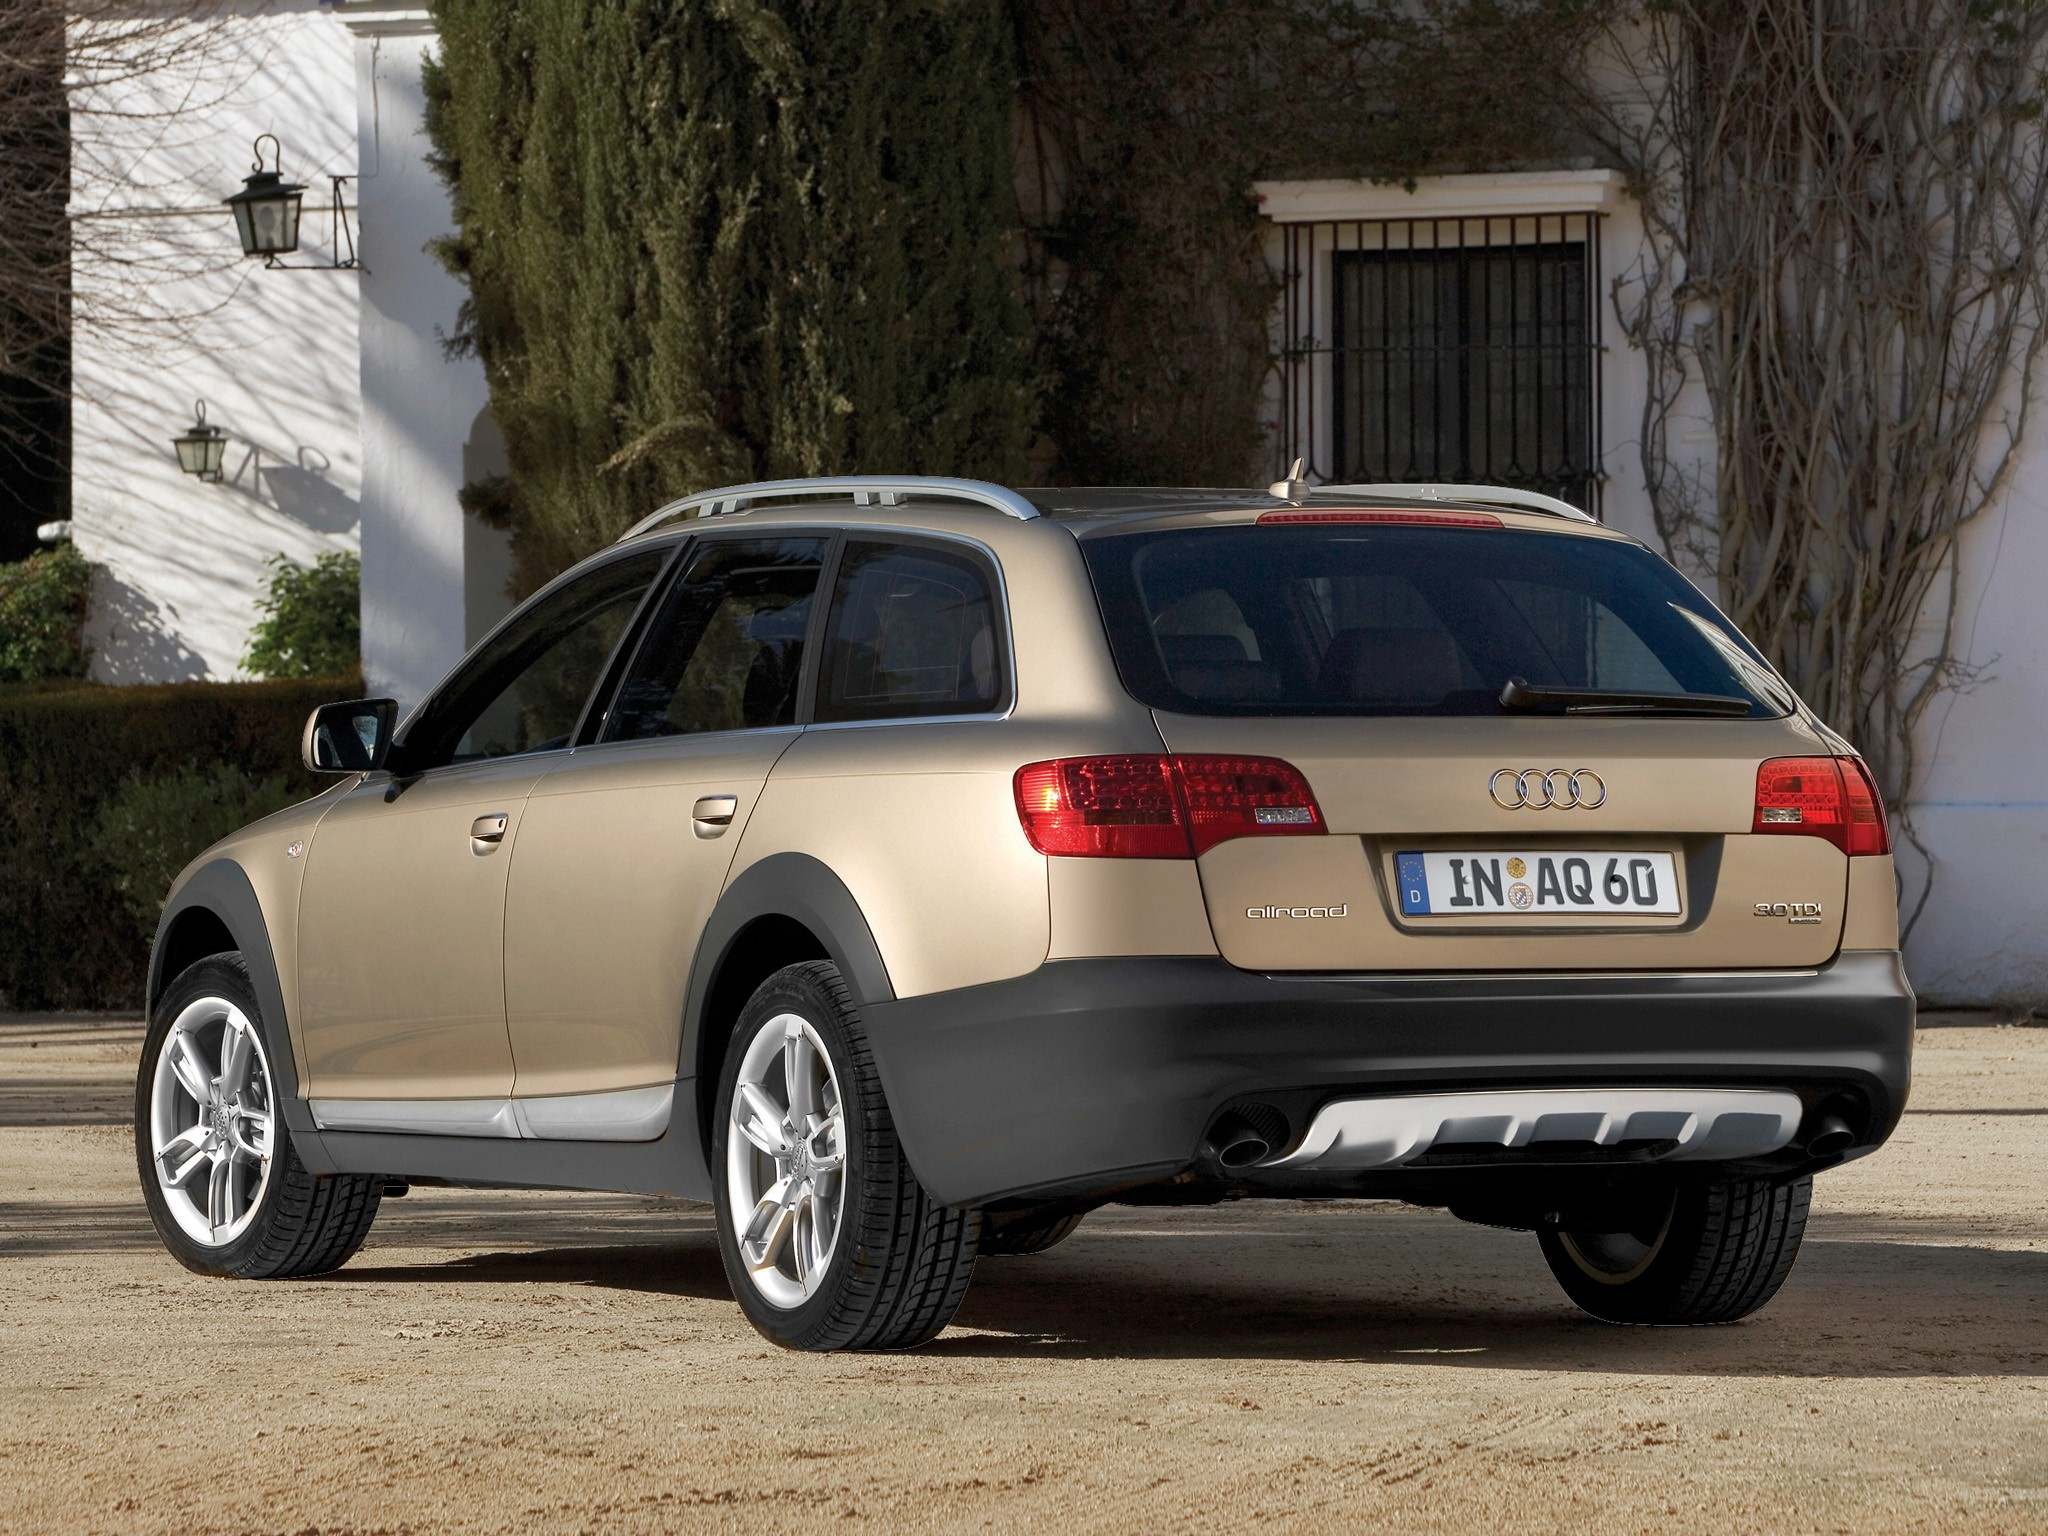 Audi A6 Allroad Specs Amp Photos 2006 2007 2008 2009 2010 2011 Autoevolution